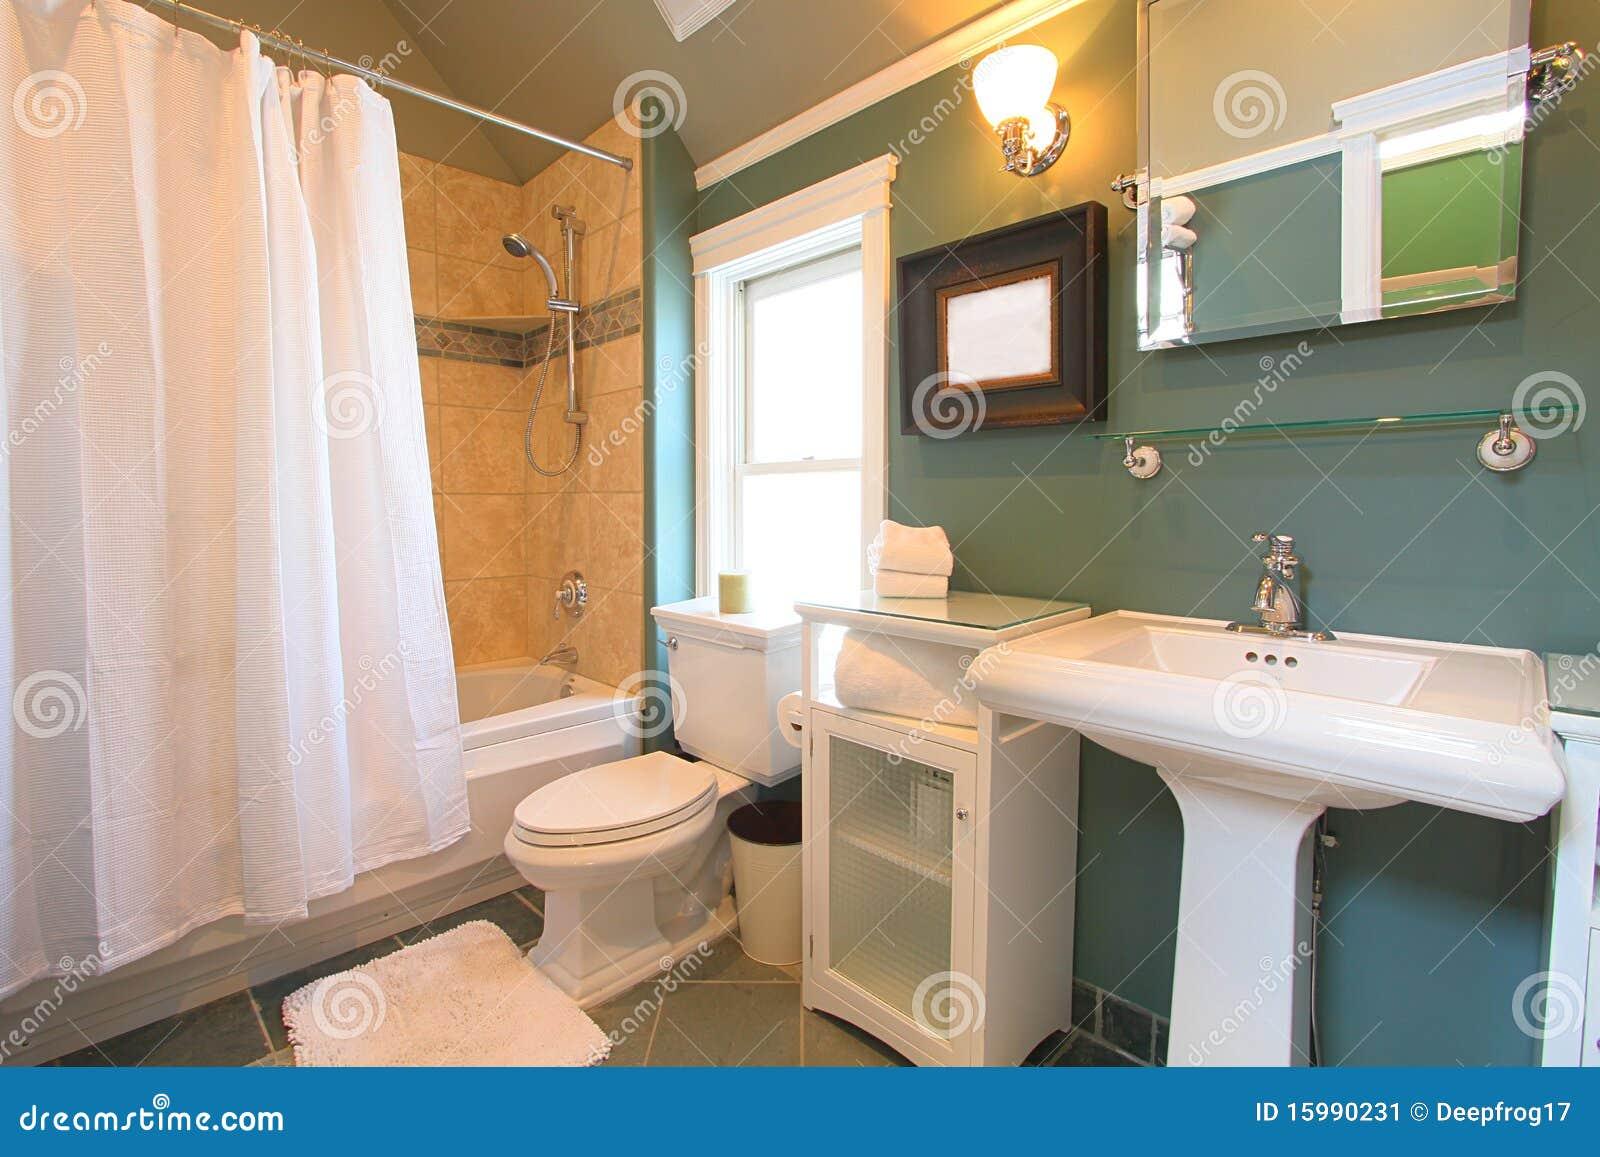 Moderne badkamers stock afbeelding afbeelding bestaande uit spiegel 15990231 for Moderne badkamers